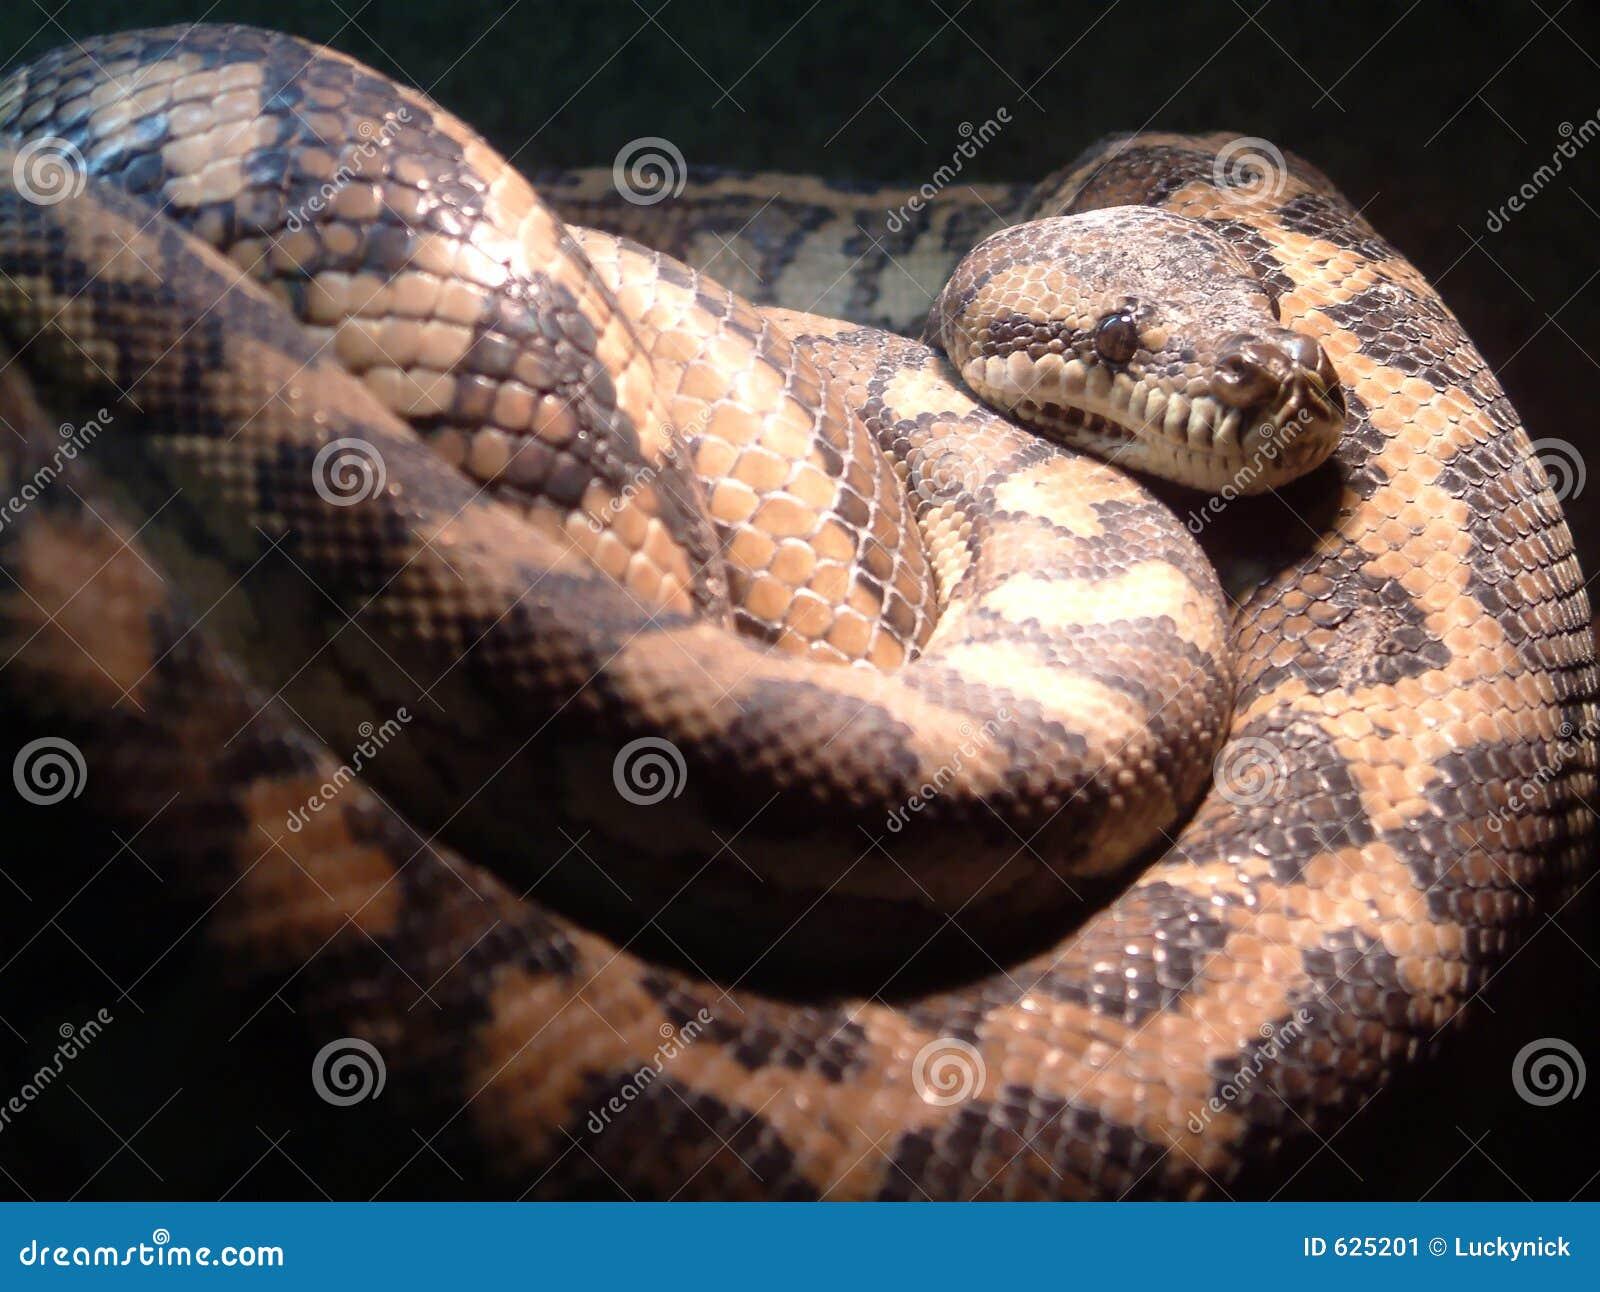 King Cobra vs Olive Water Snake - National Geographic